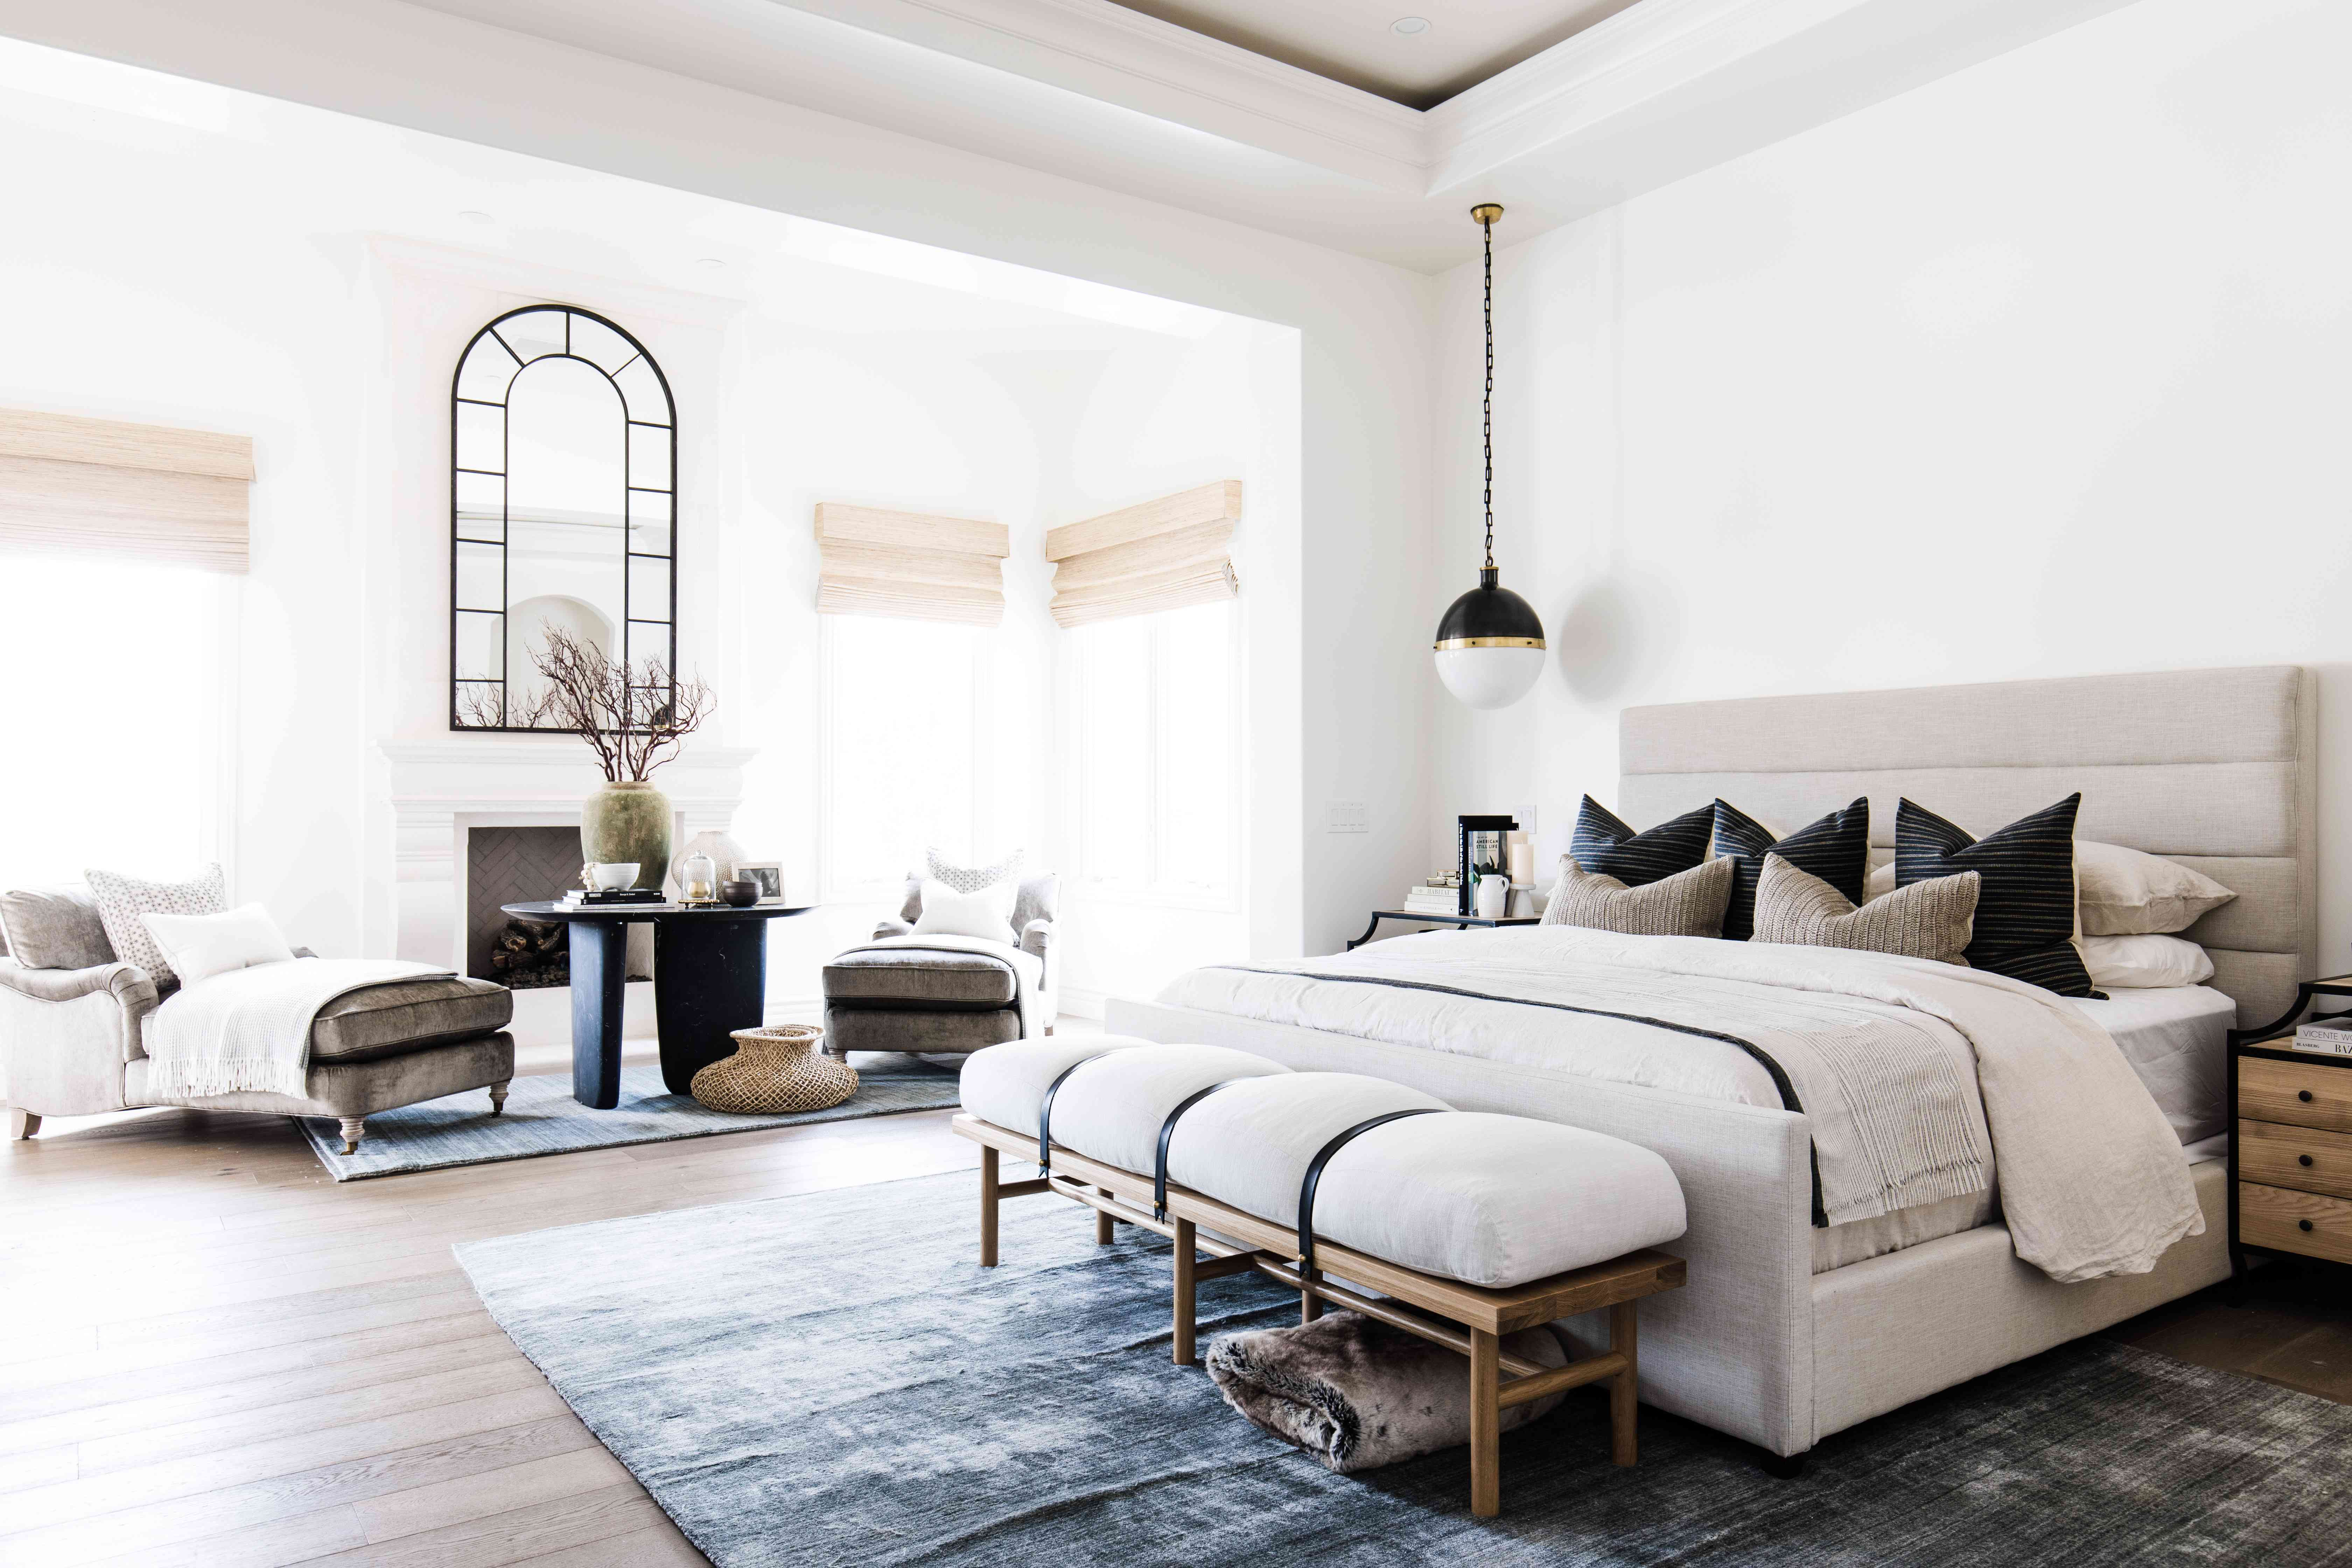 arizona home tour - master bedroom